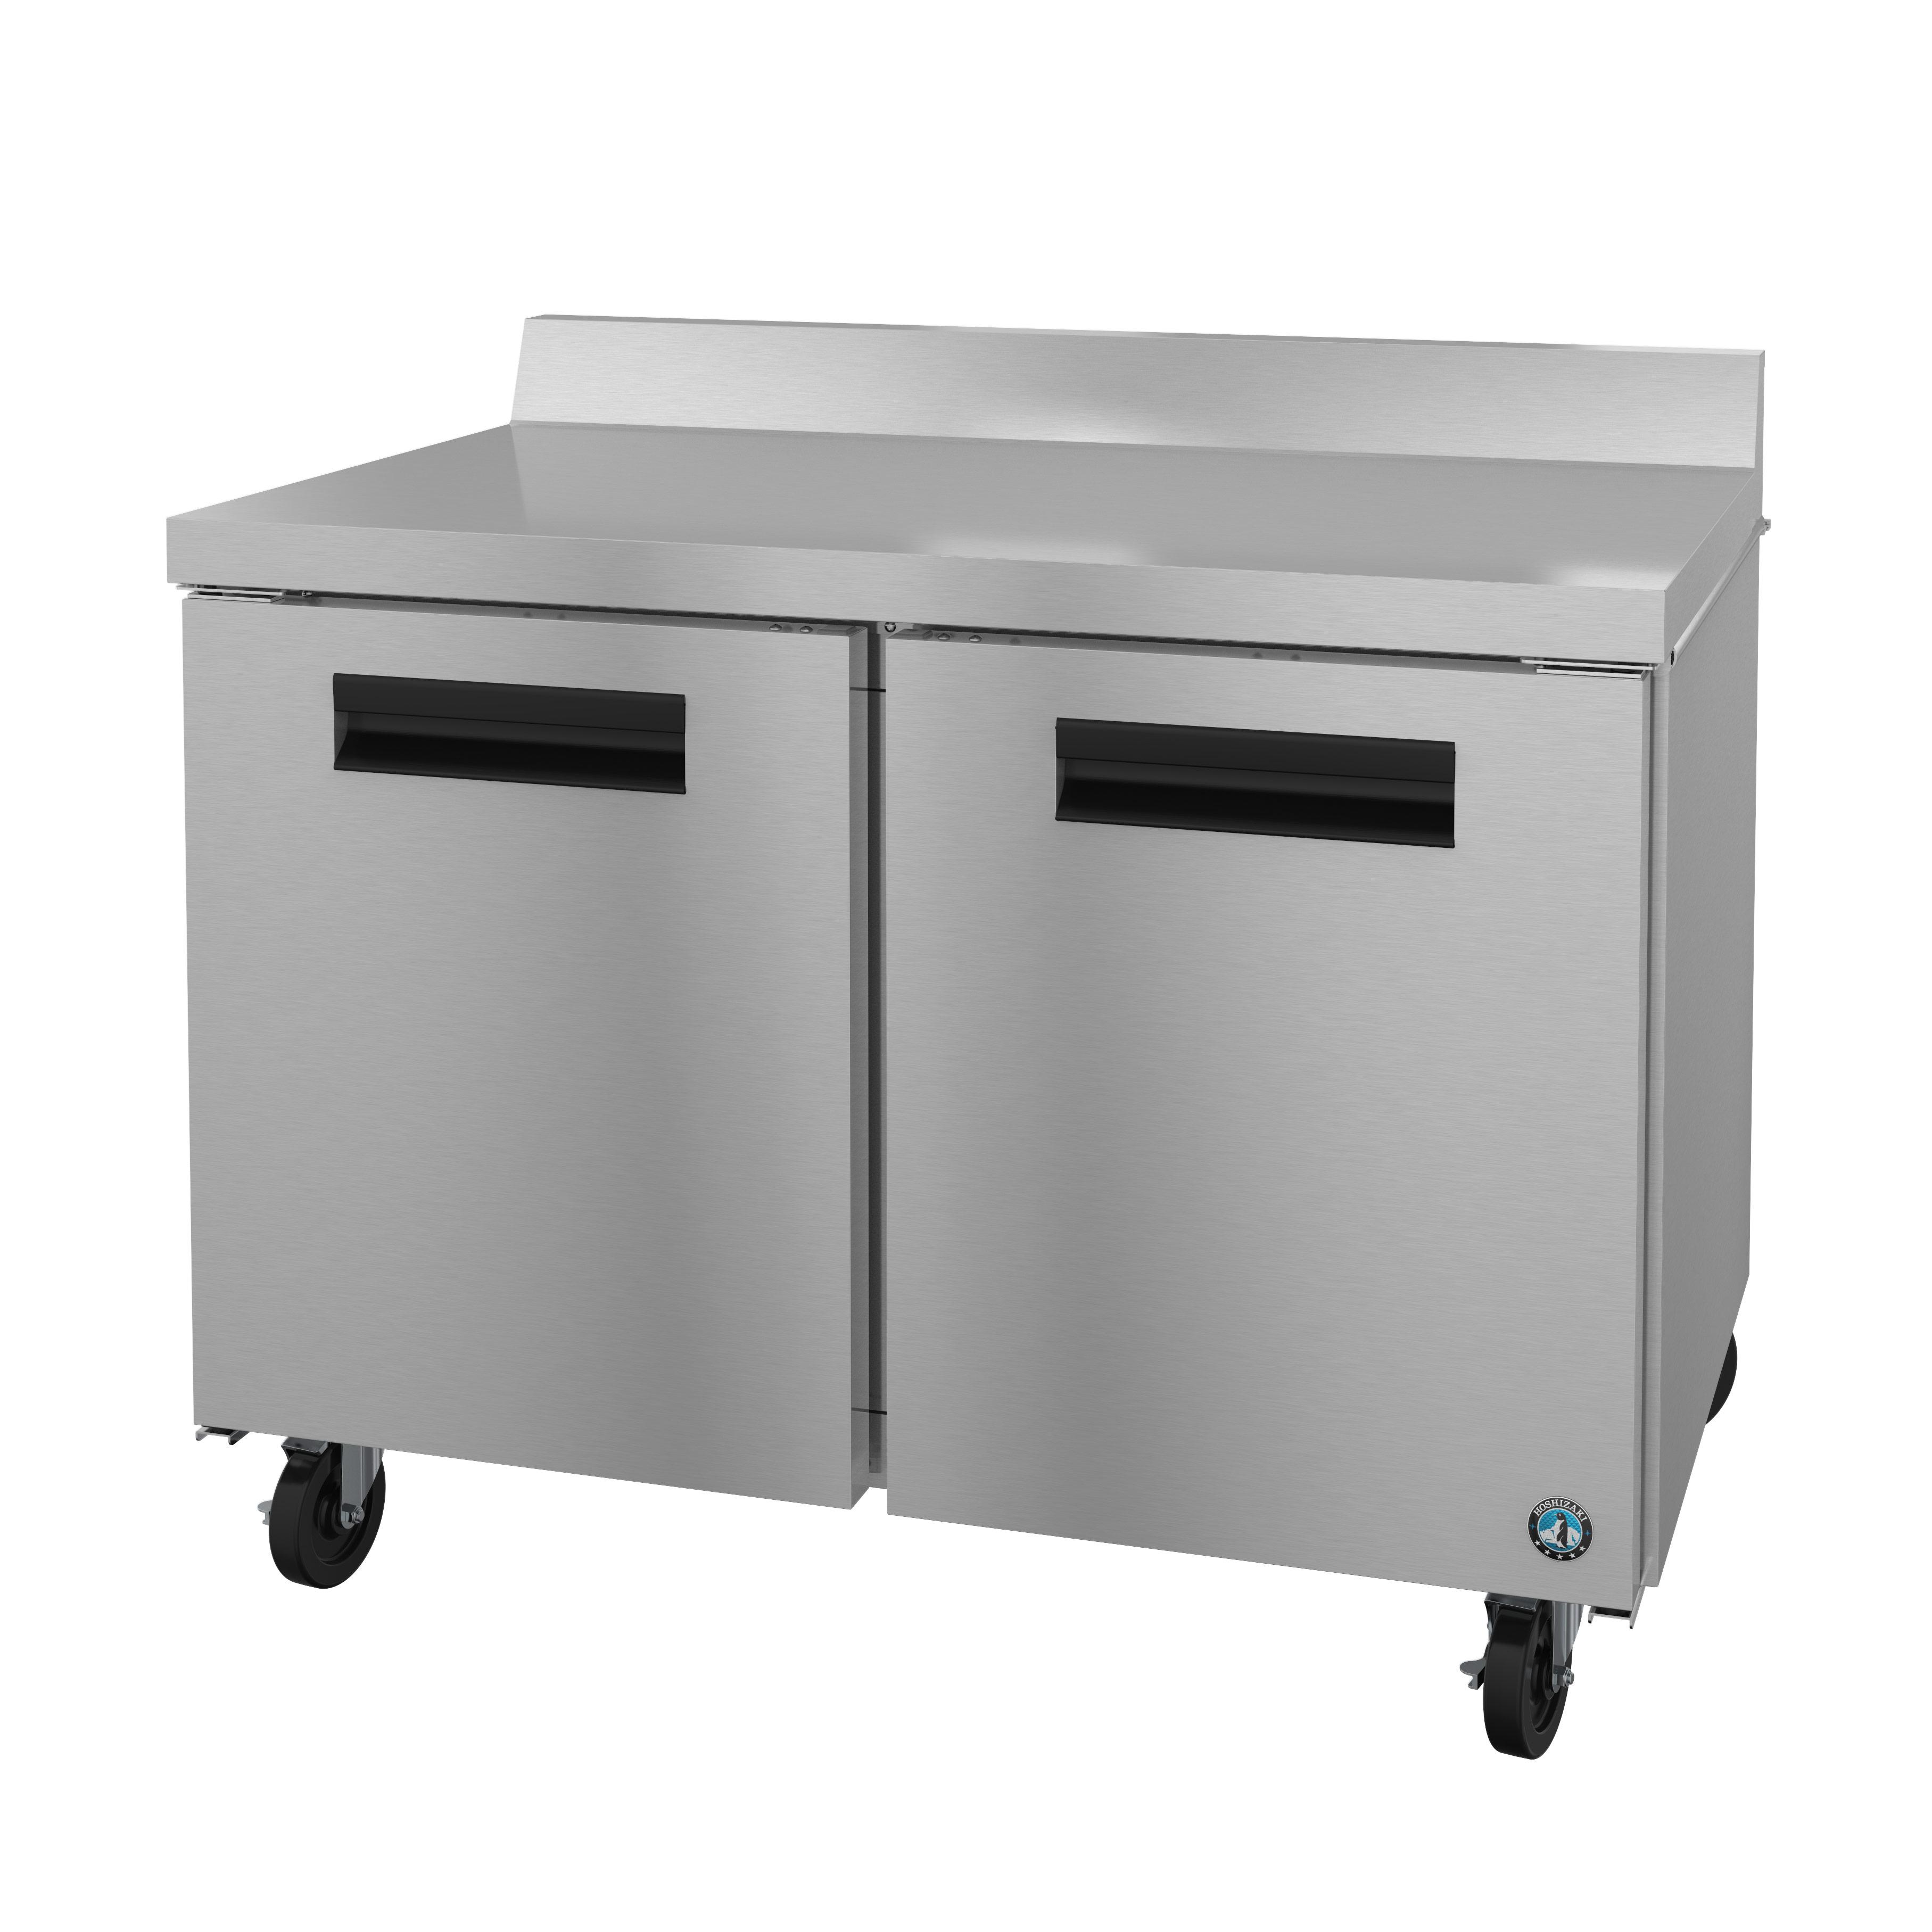 Hoshizaki WR48A refrigerated counter, work top